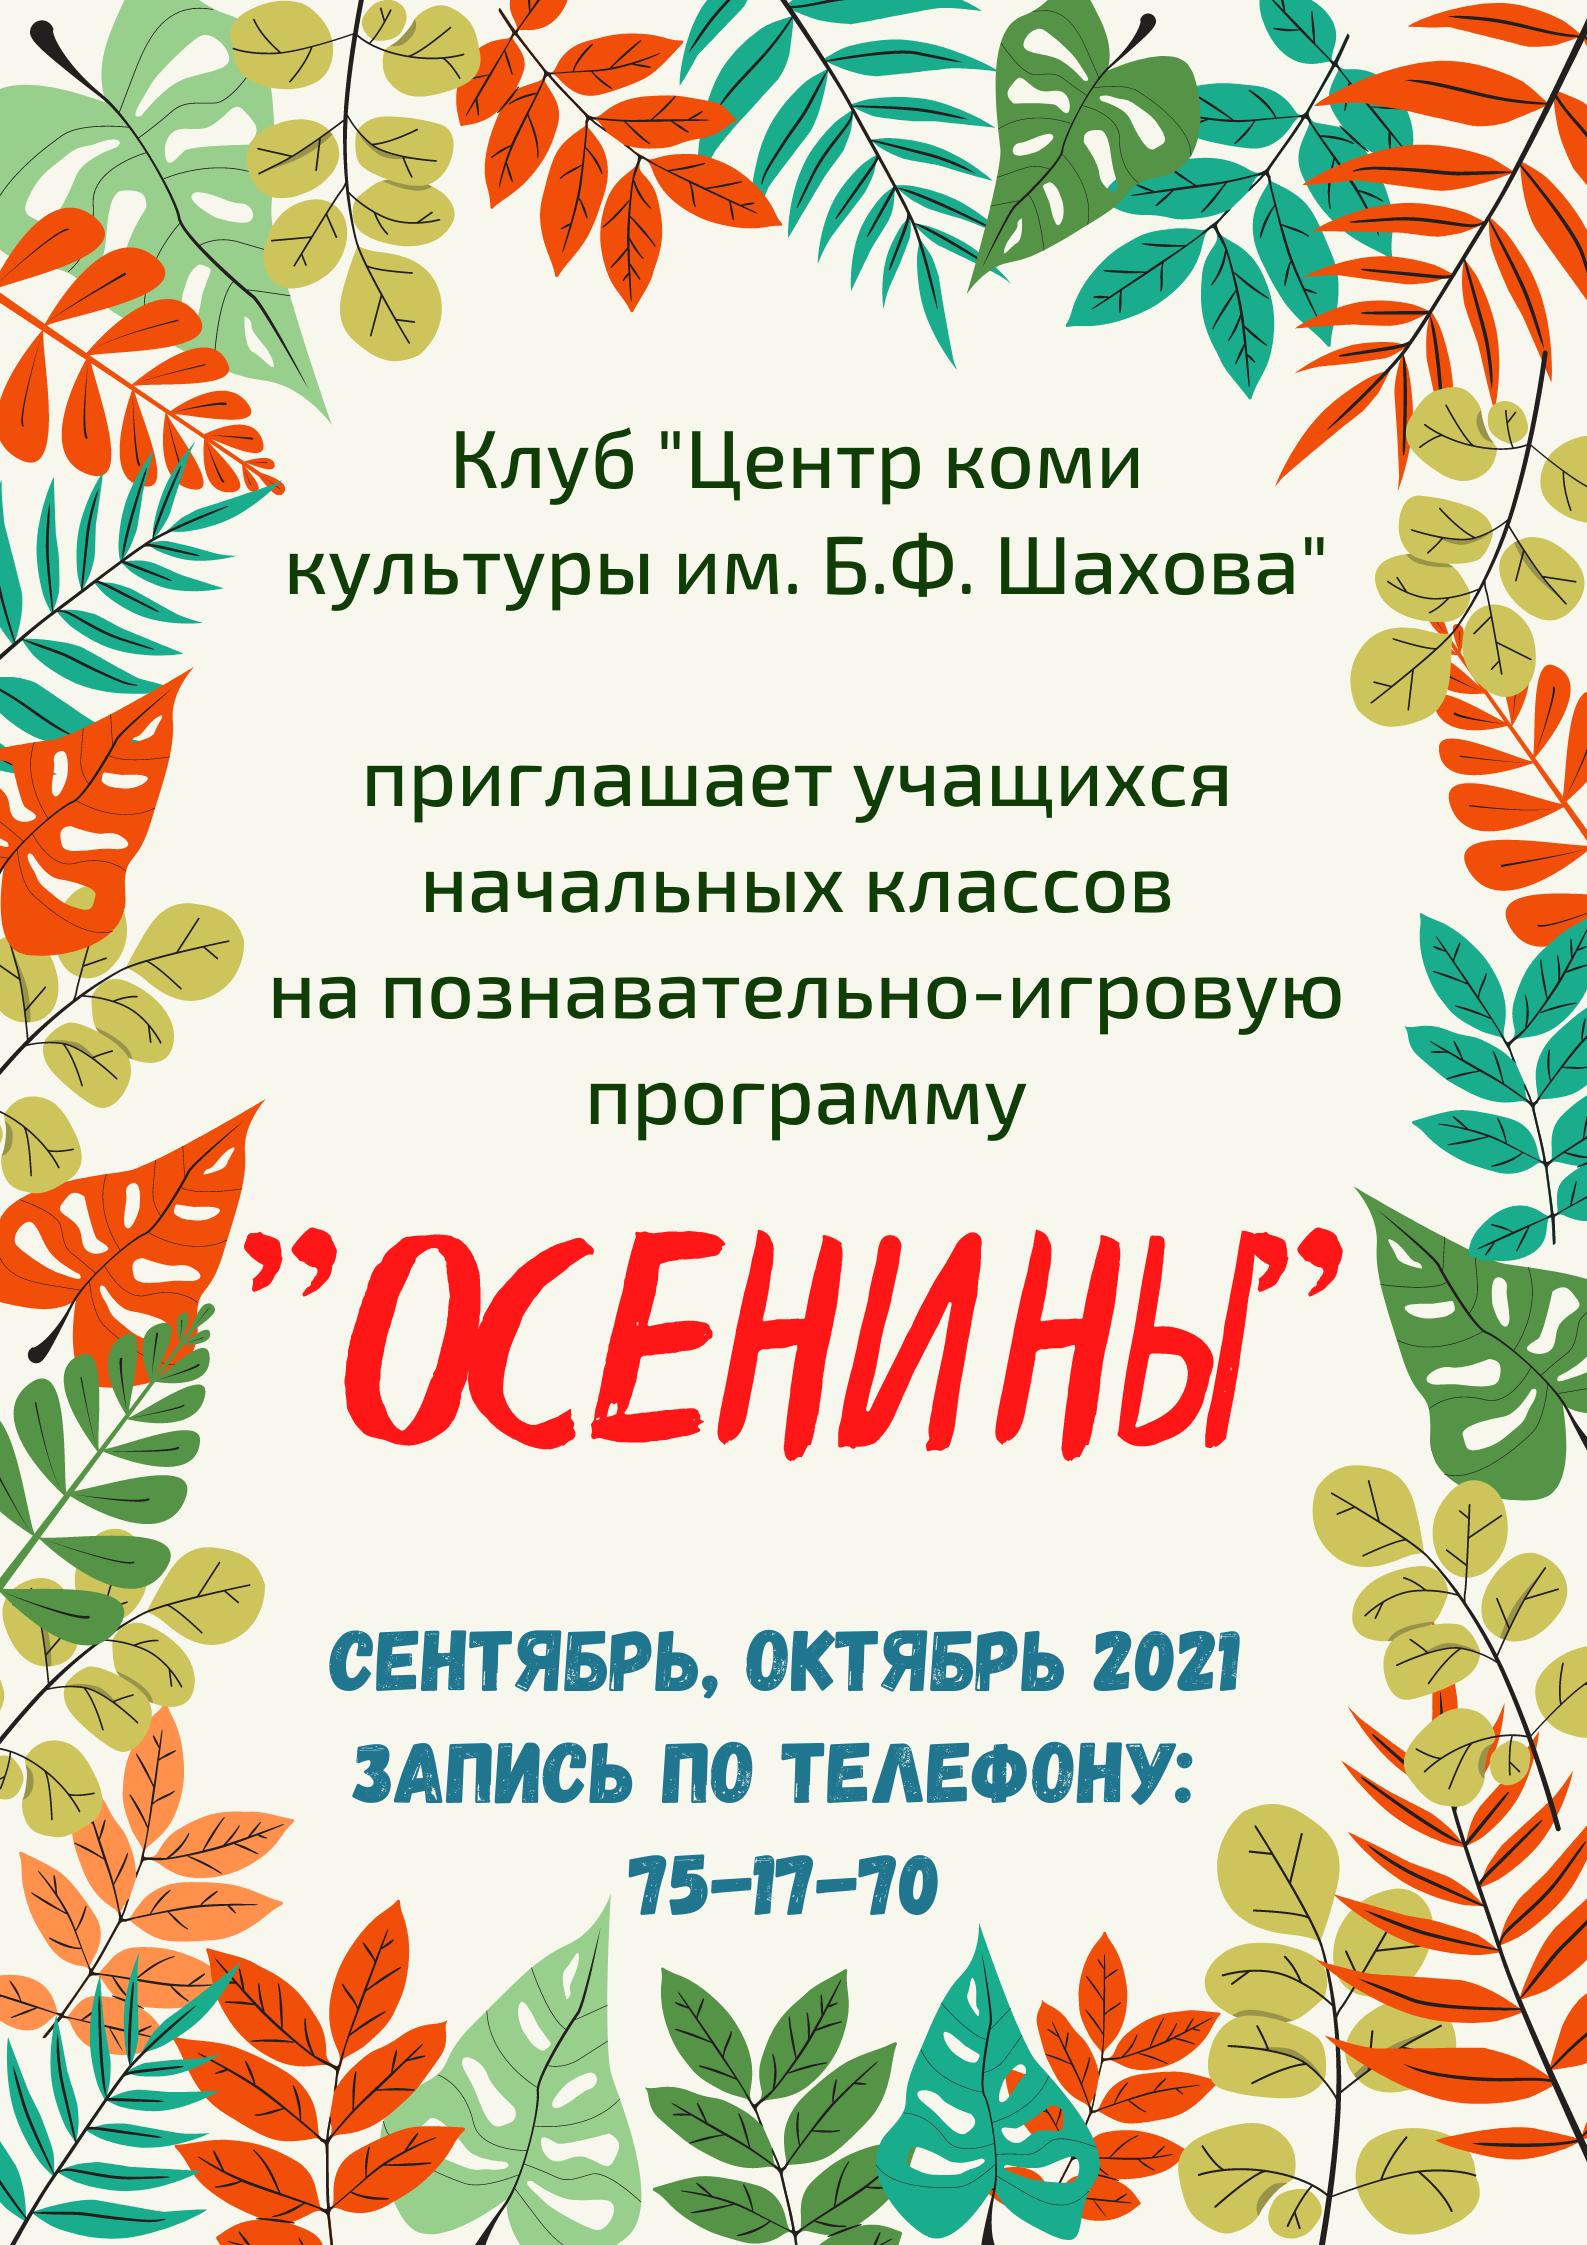 Центр коми культуры им. Б.Ф. Шахова